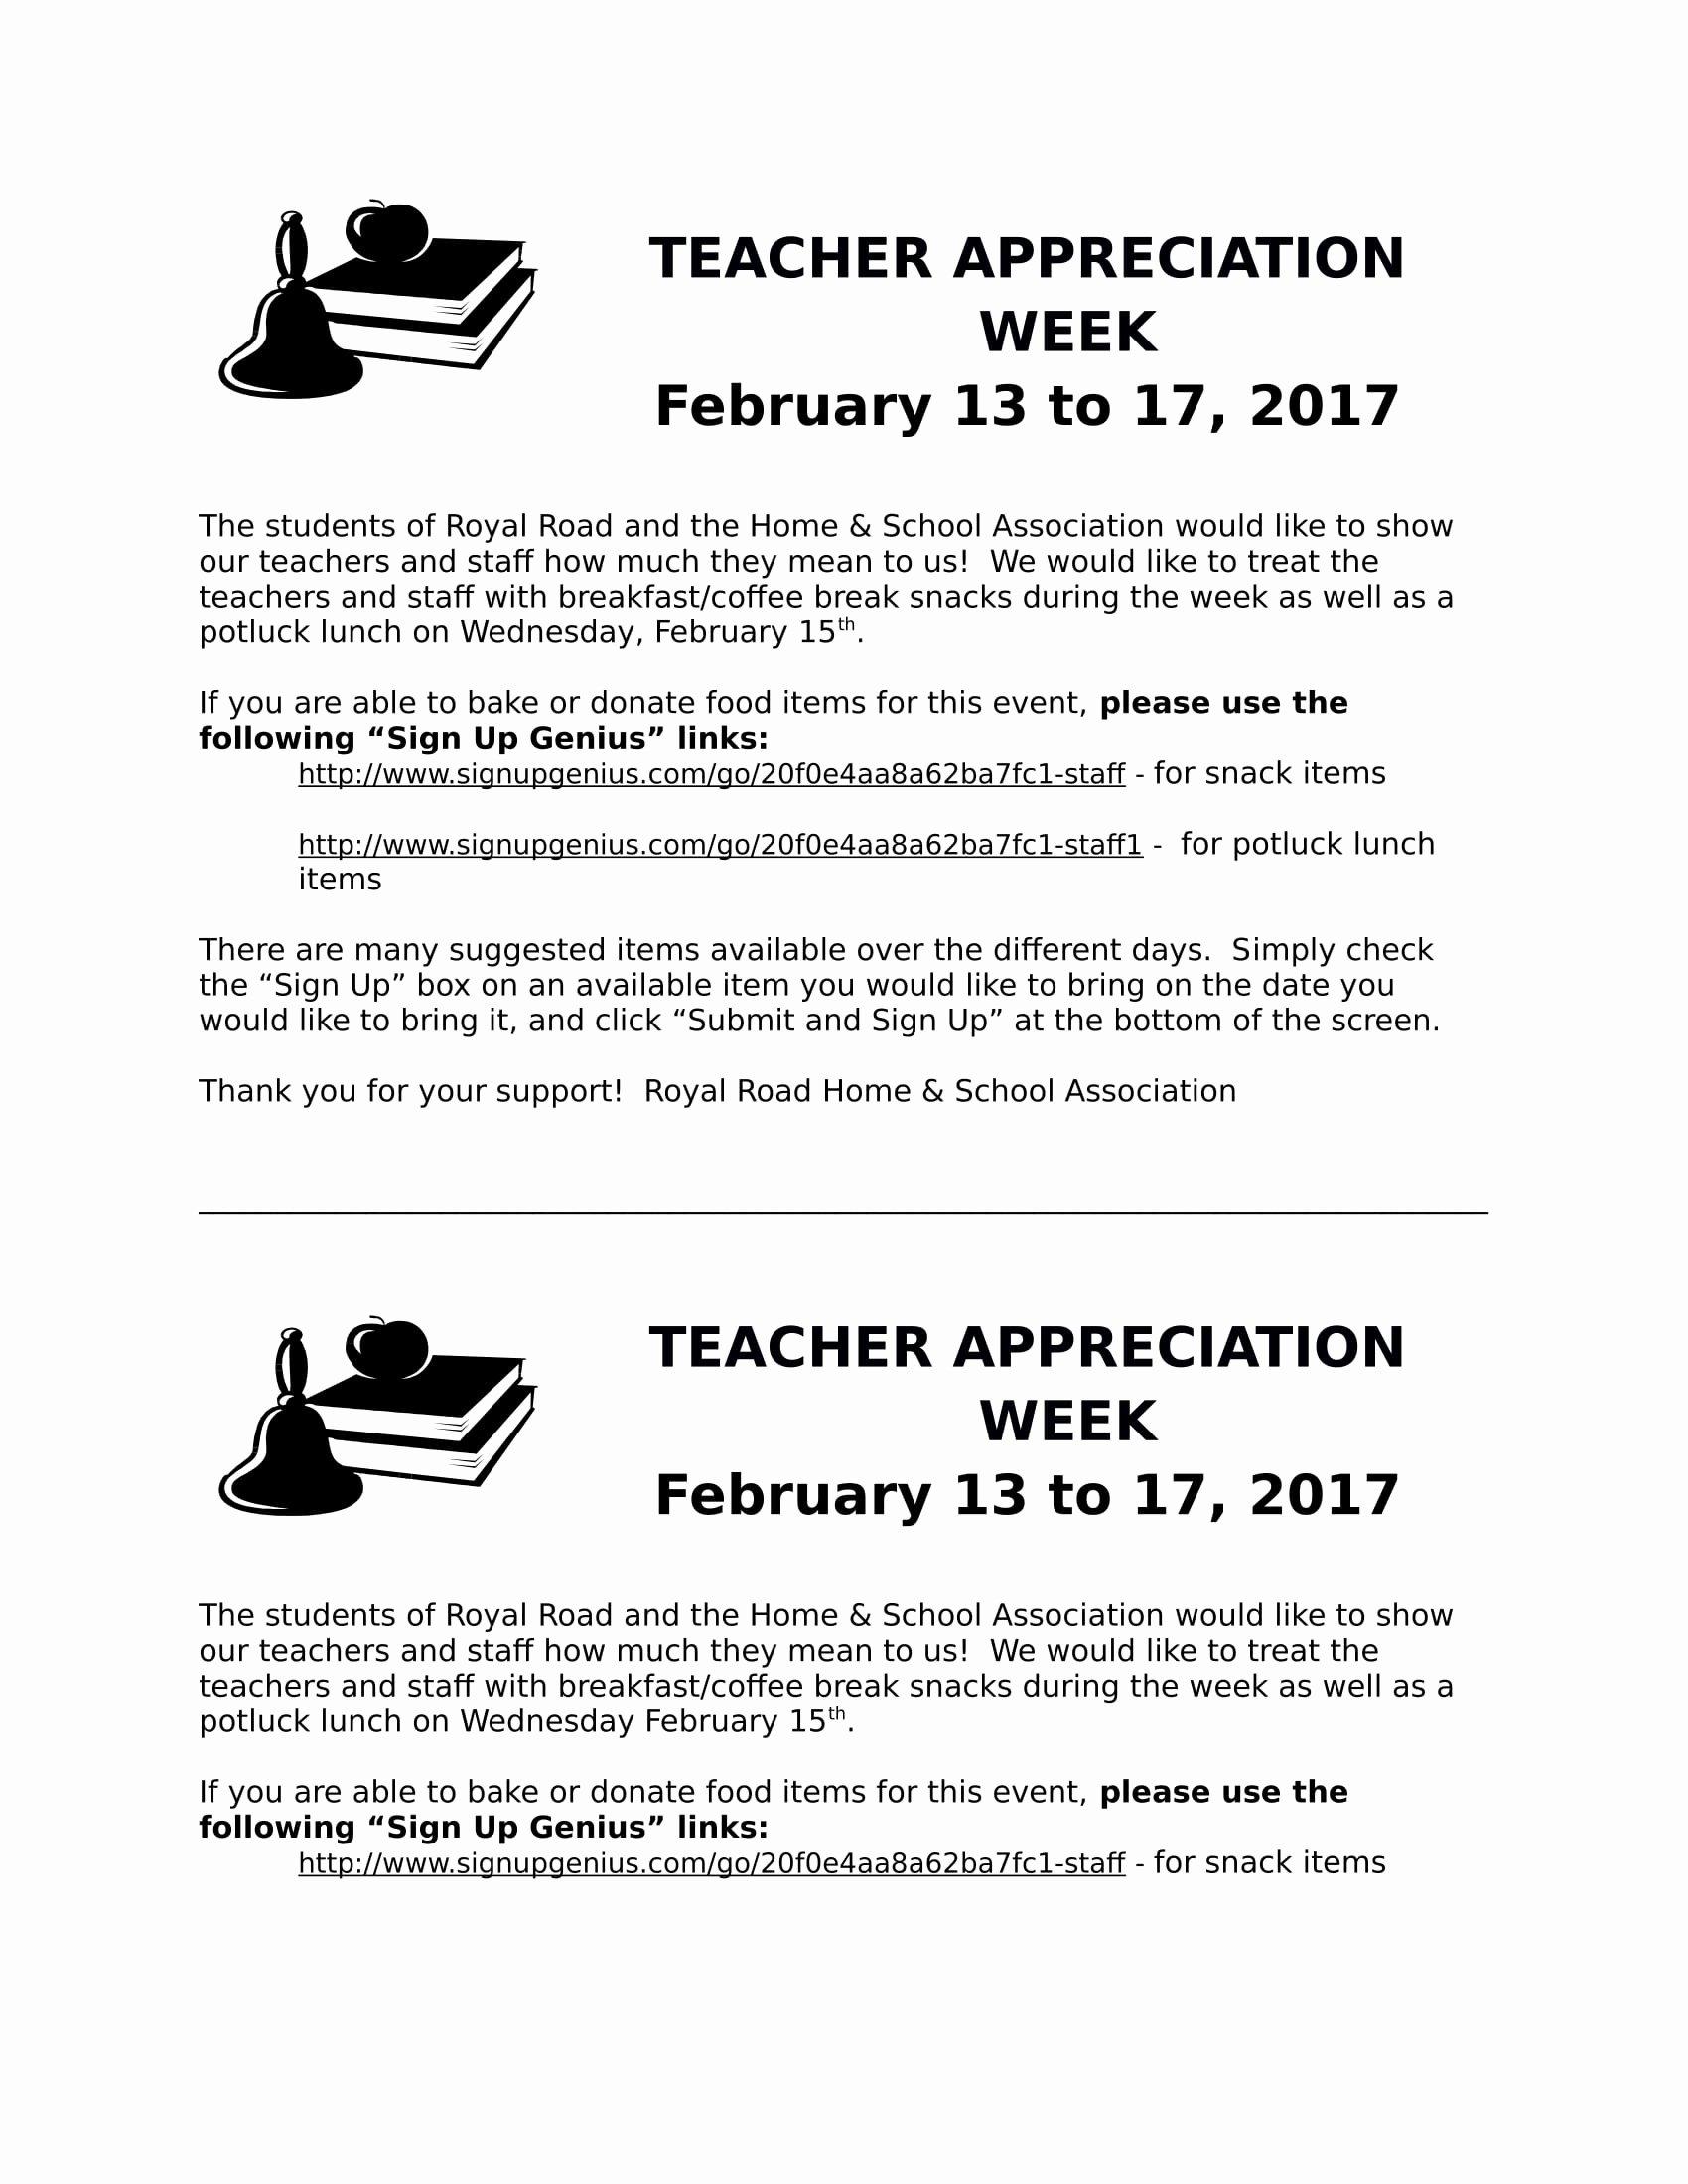 Letter Of Appreciation Templates Inspirational 11 Teacher Appreciation Letter Templates Pdf Doc